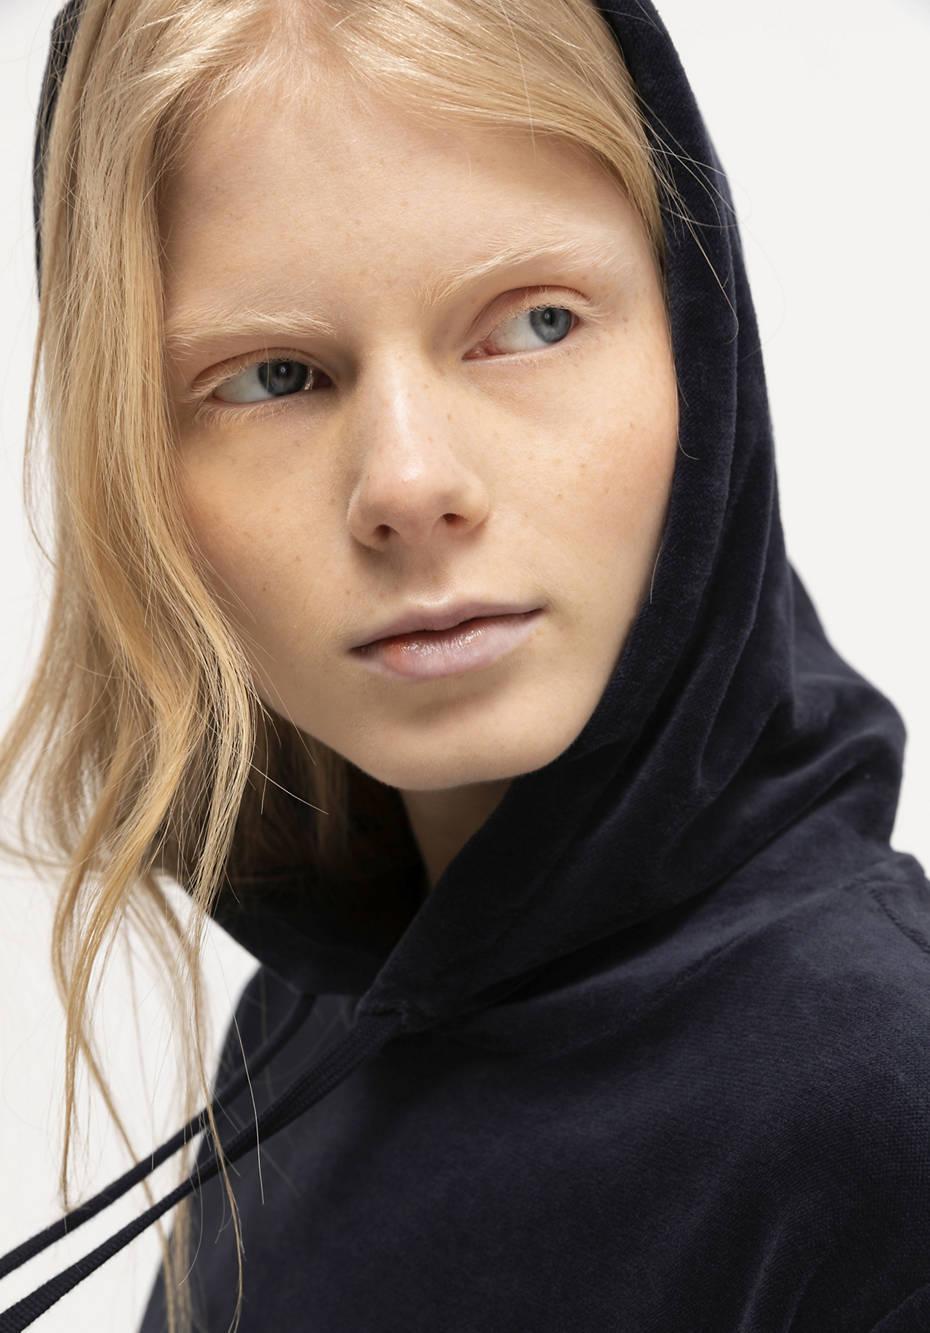 Nicki-Hoodie aus reiner Bio-Baumwolle